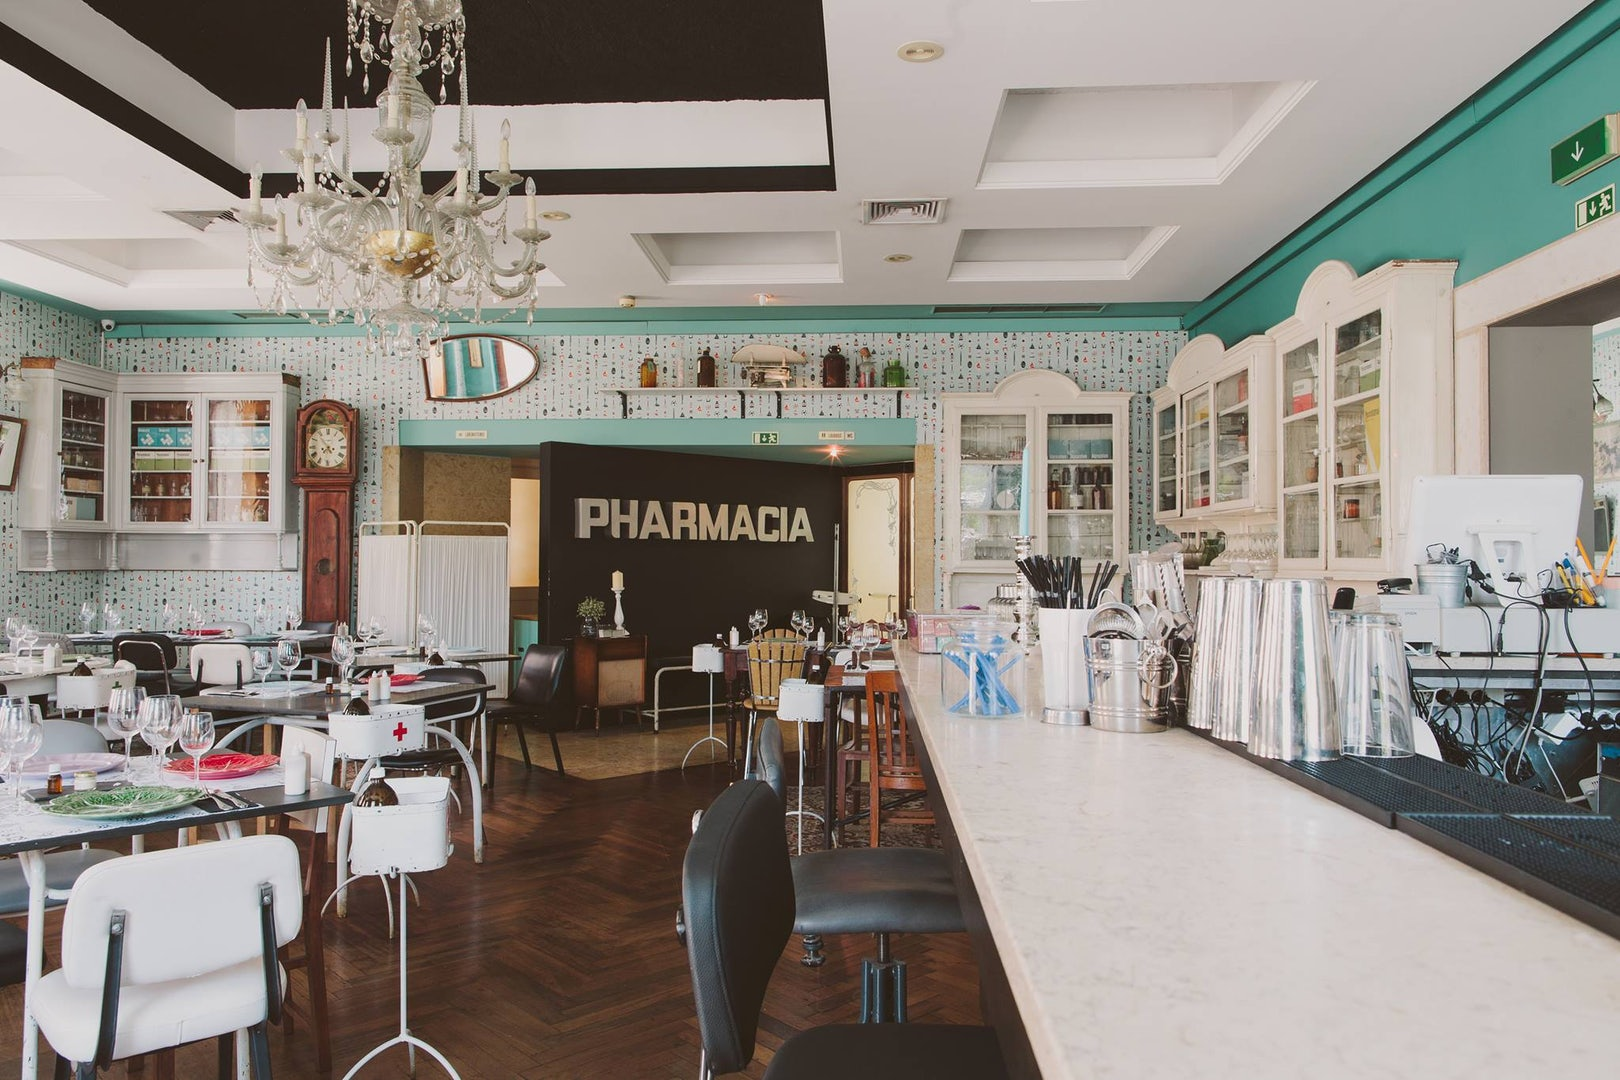 bar la Pharmacia in Lisbon